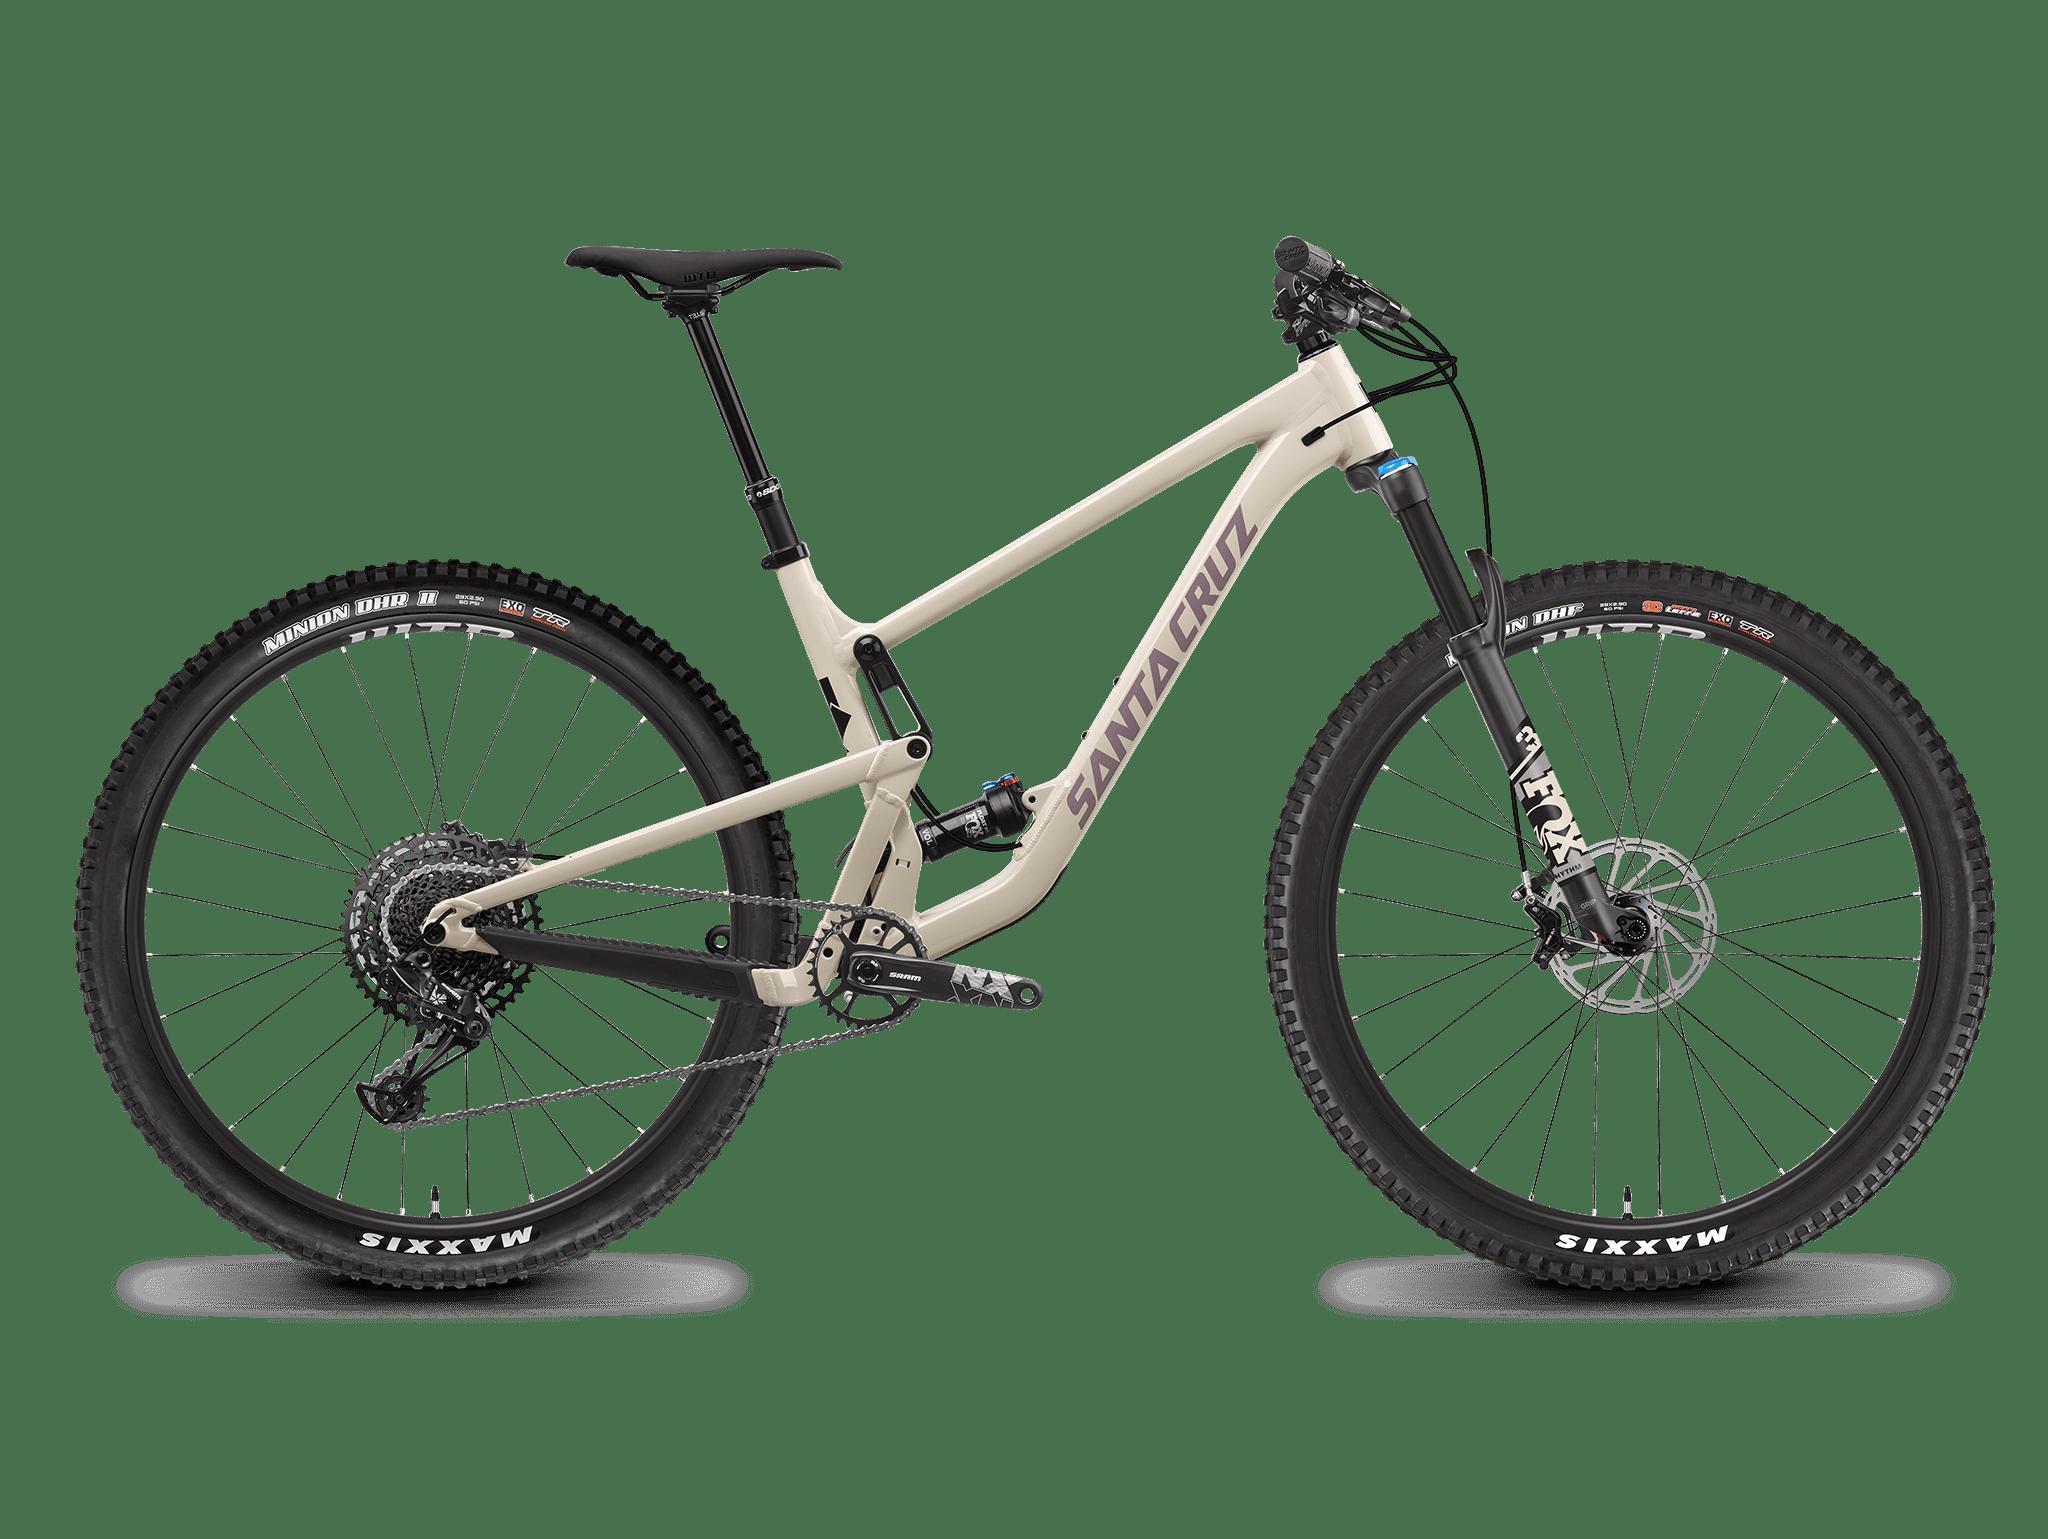 Santa Cruz Santa Cruz Tallboy - R / Aluminum / 29 (2021)